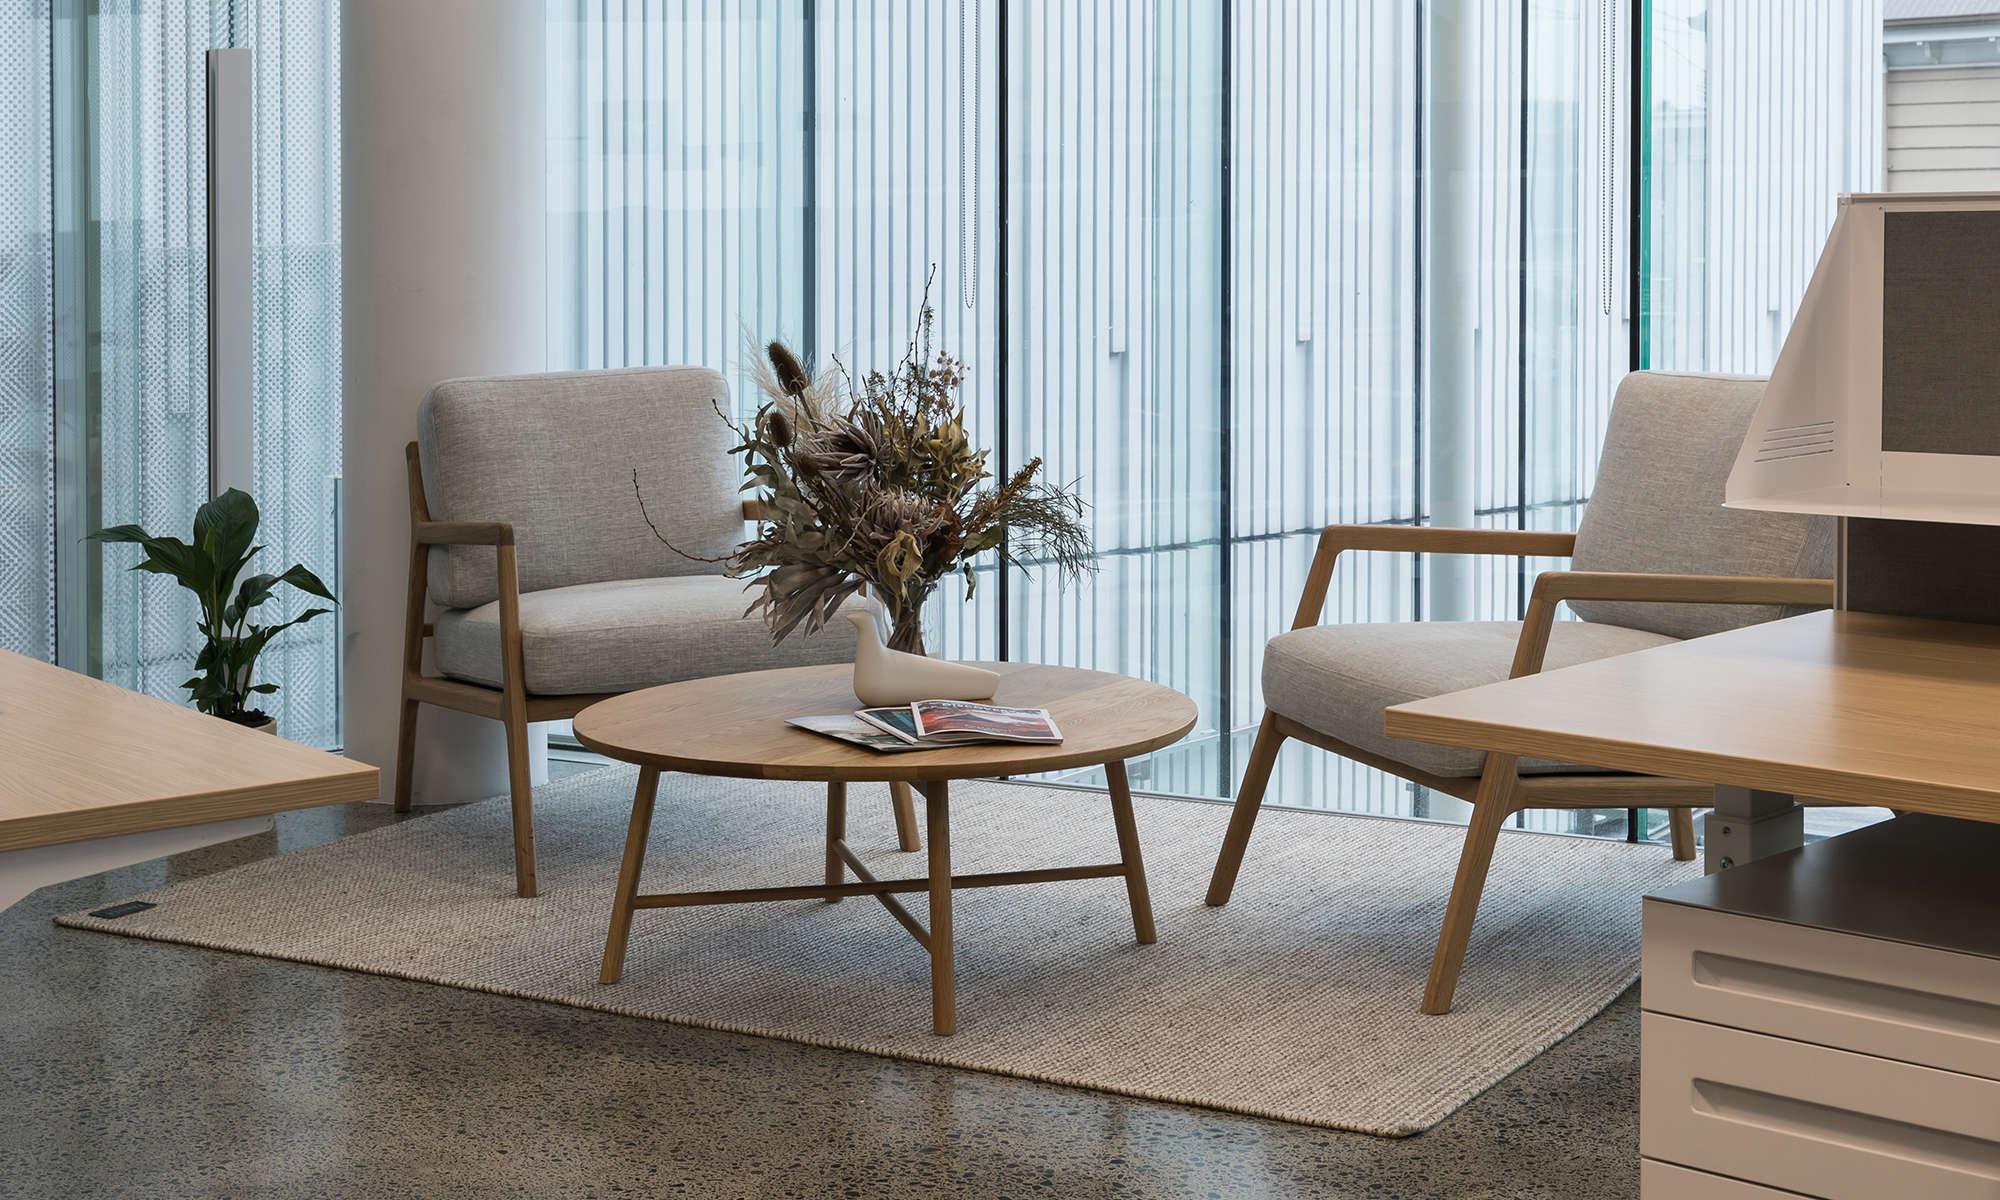 Sketch Nysse, European designed office furniture setting